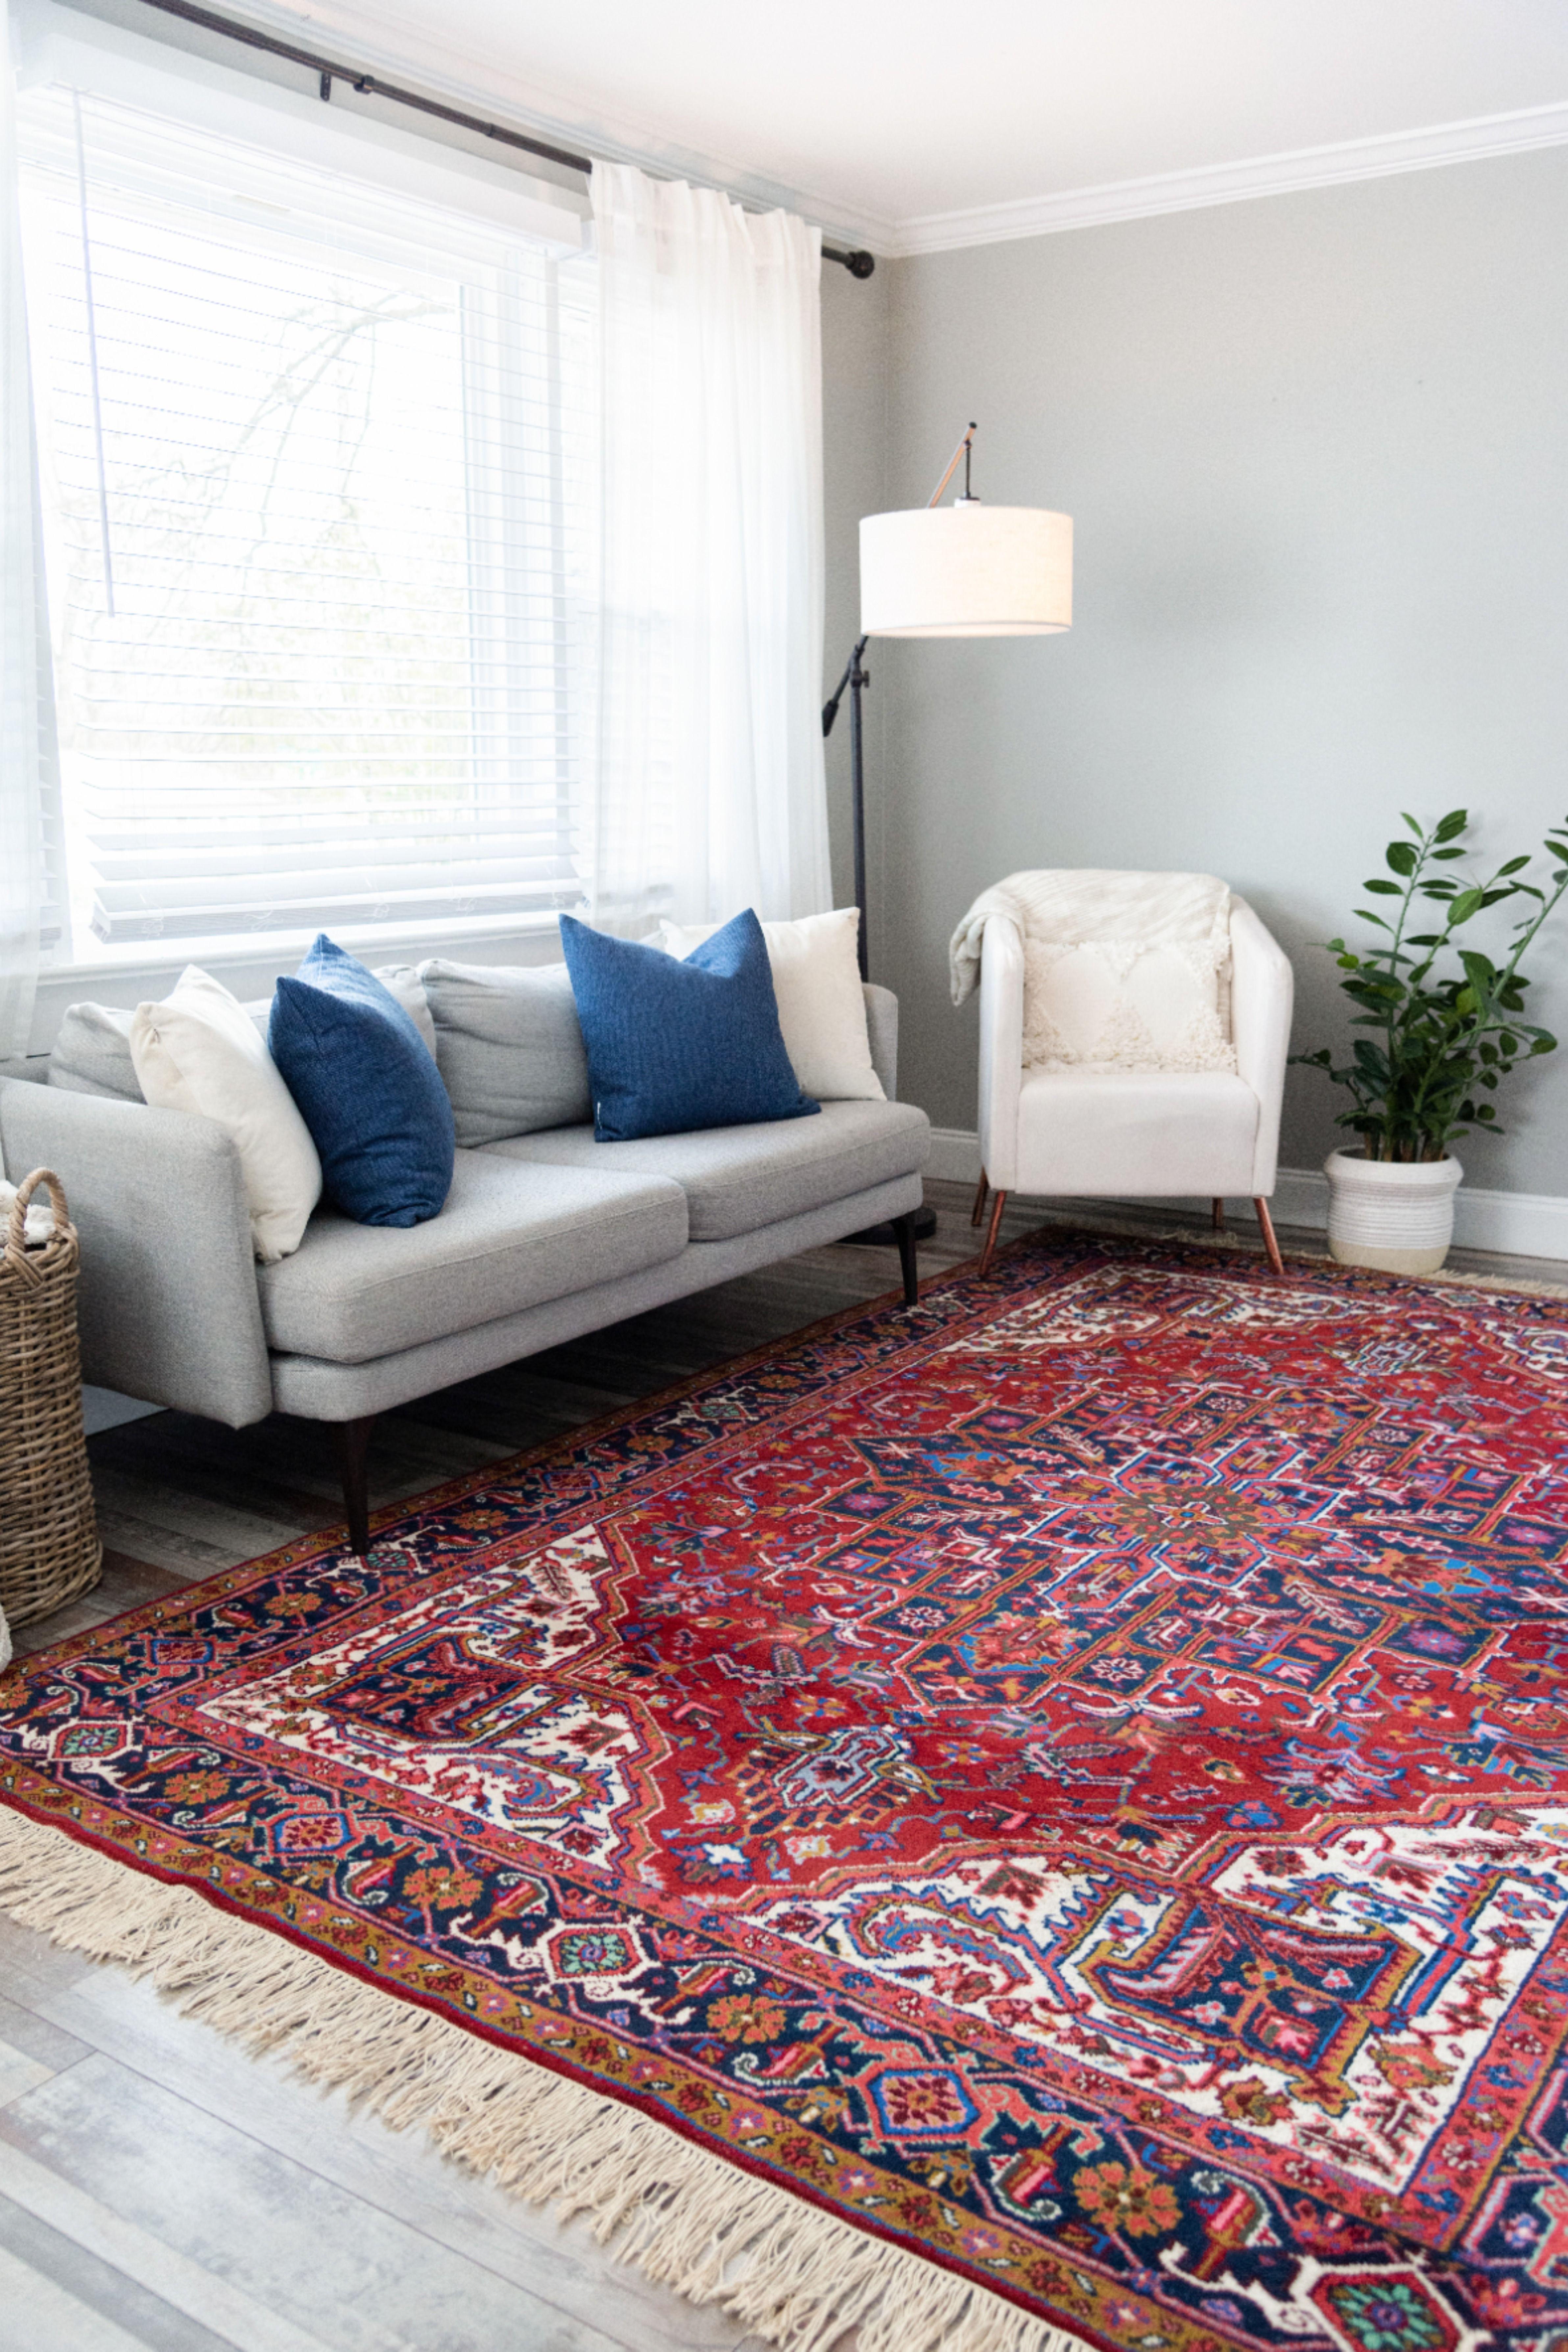 Handcraft Decor Red Persian Rug Living Room Bohemian Living Room Decor Green Sofa Living Room